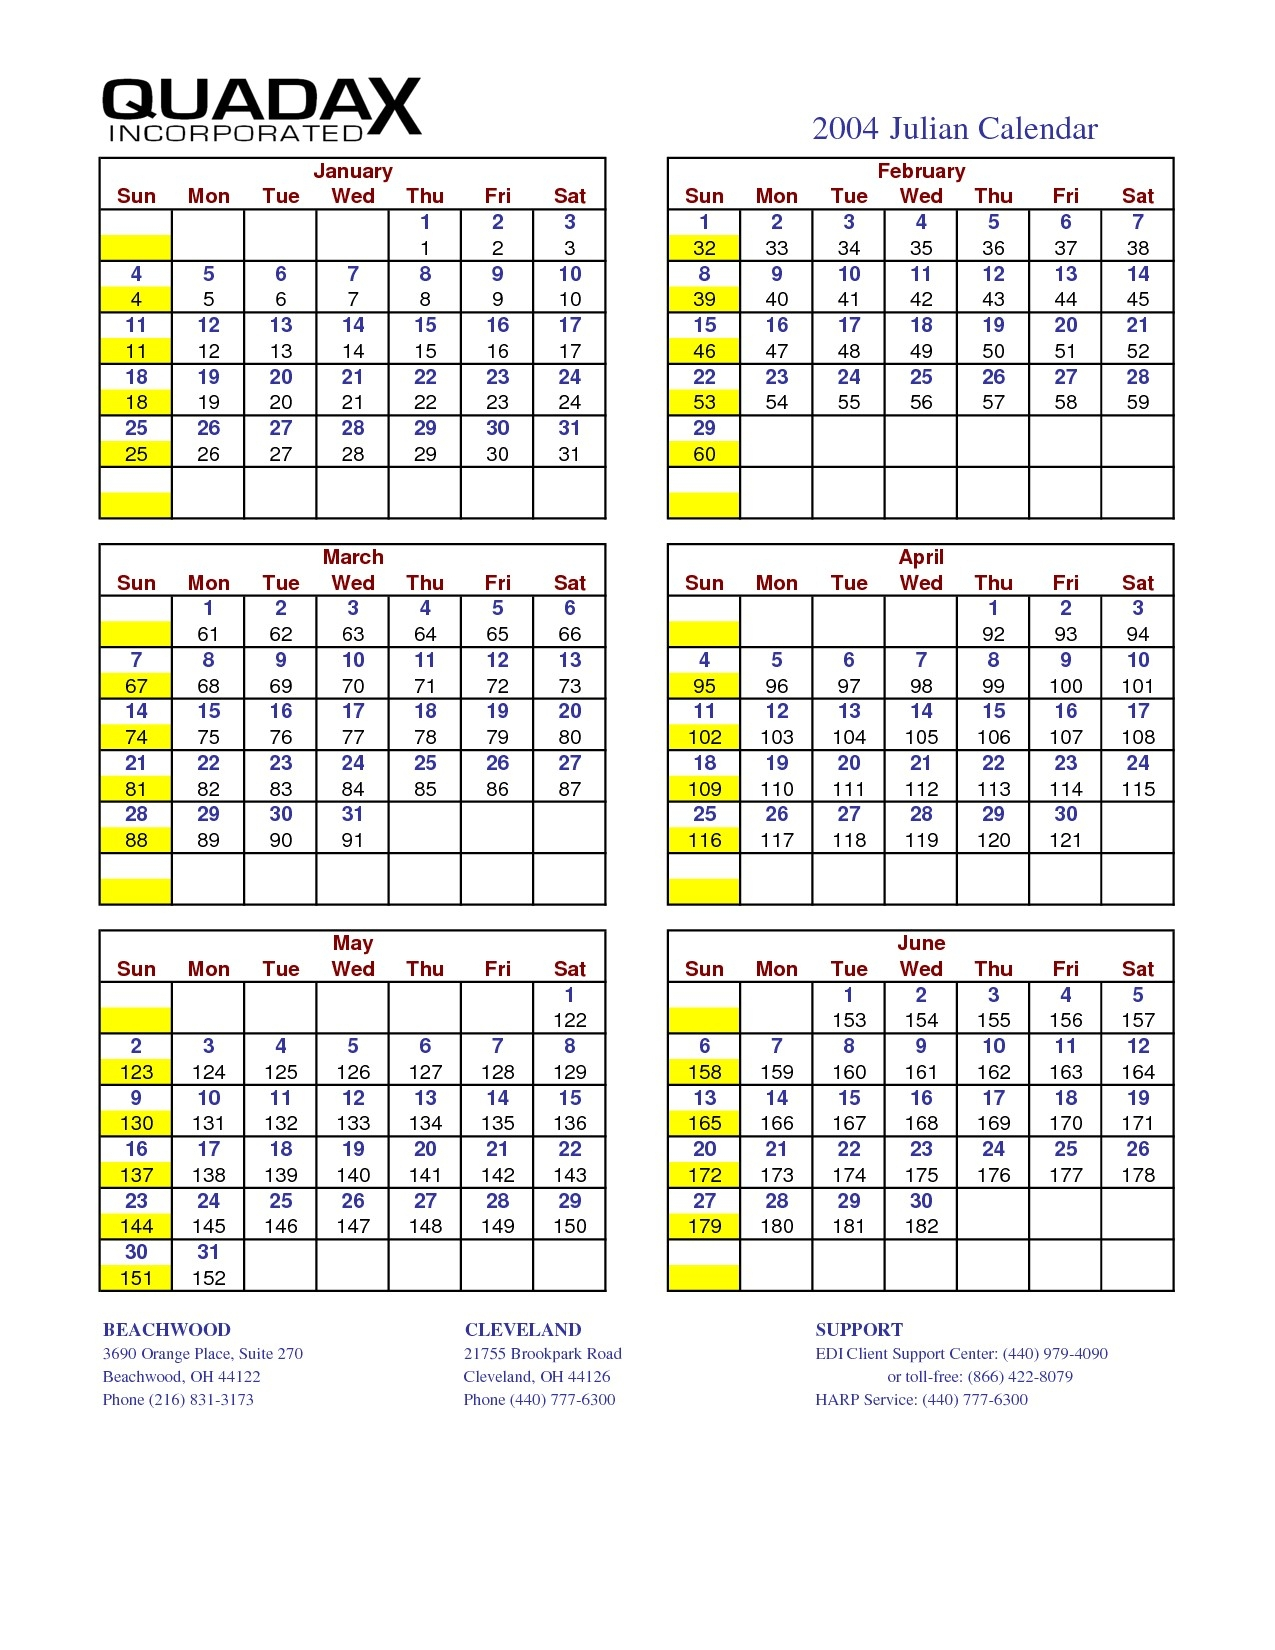 Julian Date Calendar 2021 Quadax | Free Printable Calendar